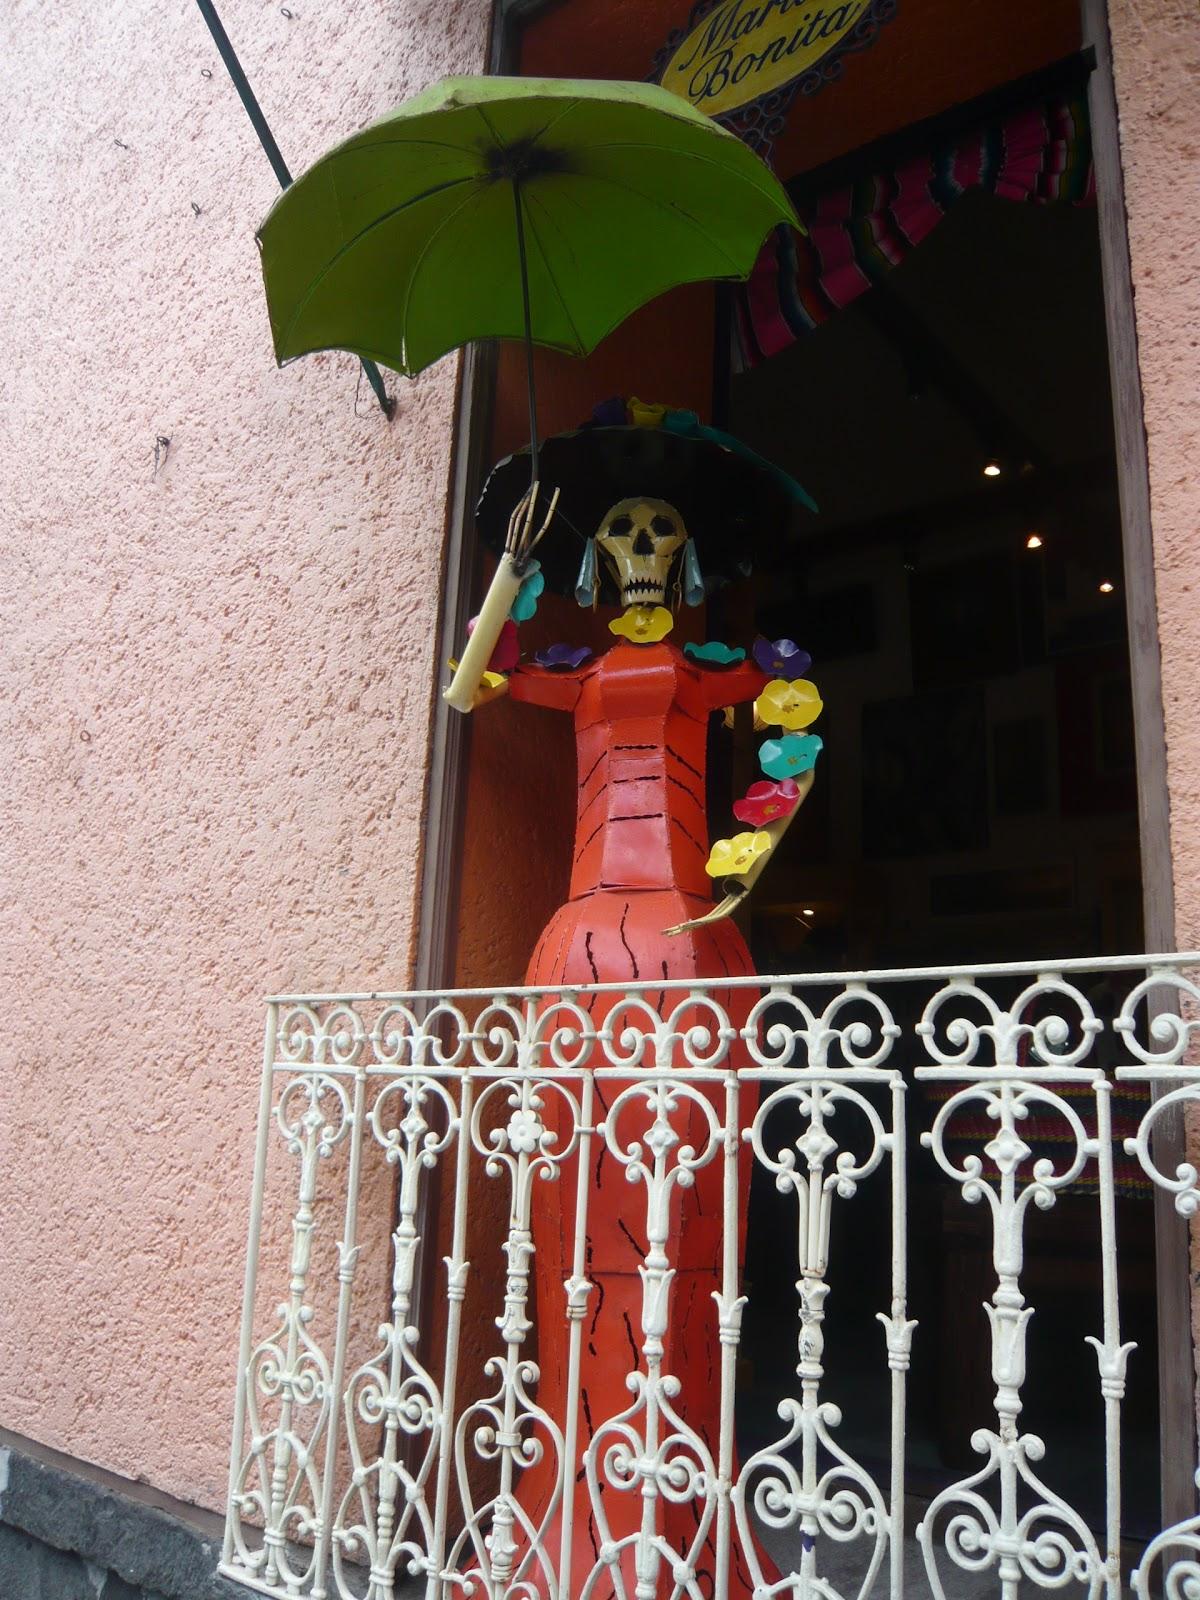 totenfigur in mexiko